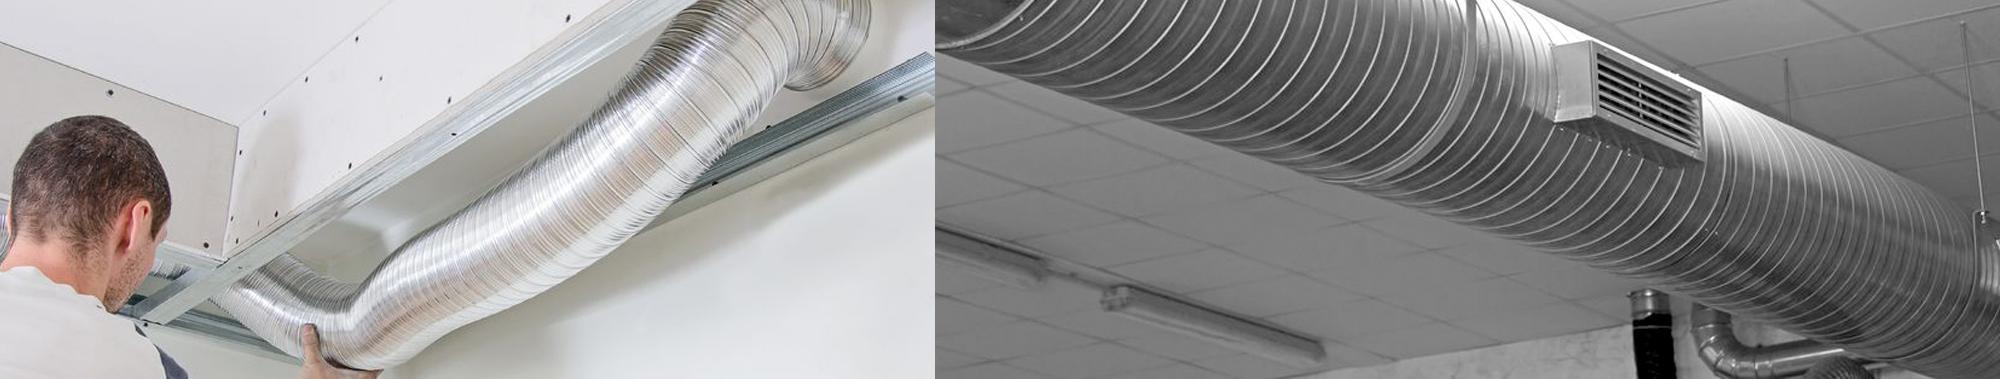 vikar ventilation